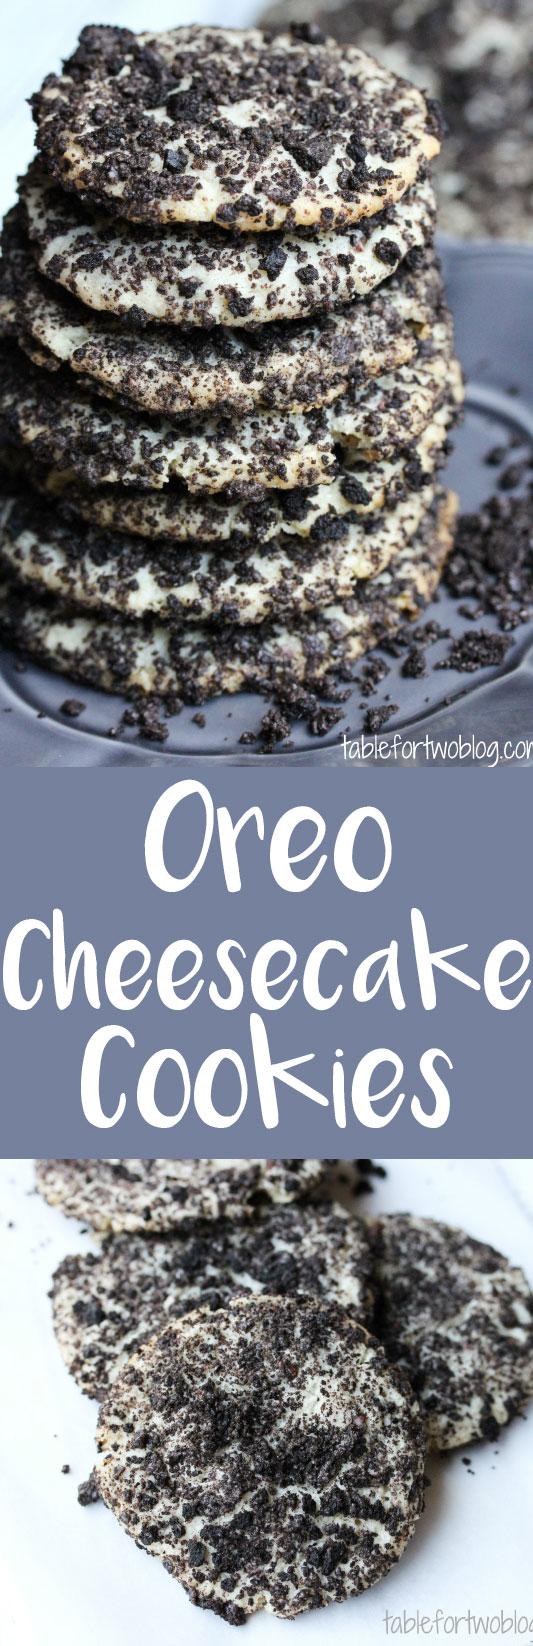 Oreo cheesecake cookies are so addicting!